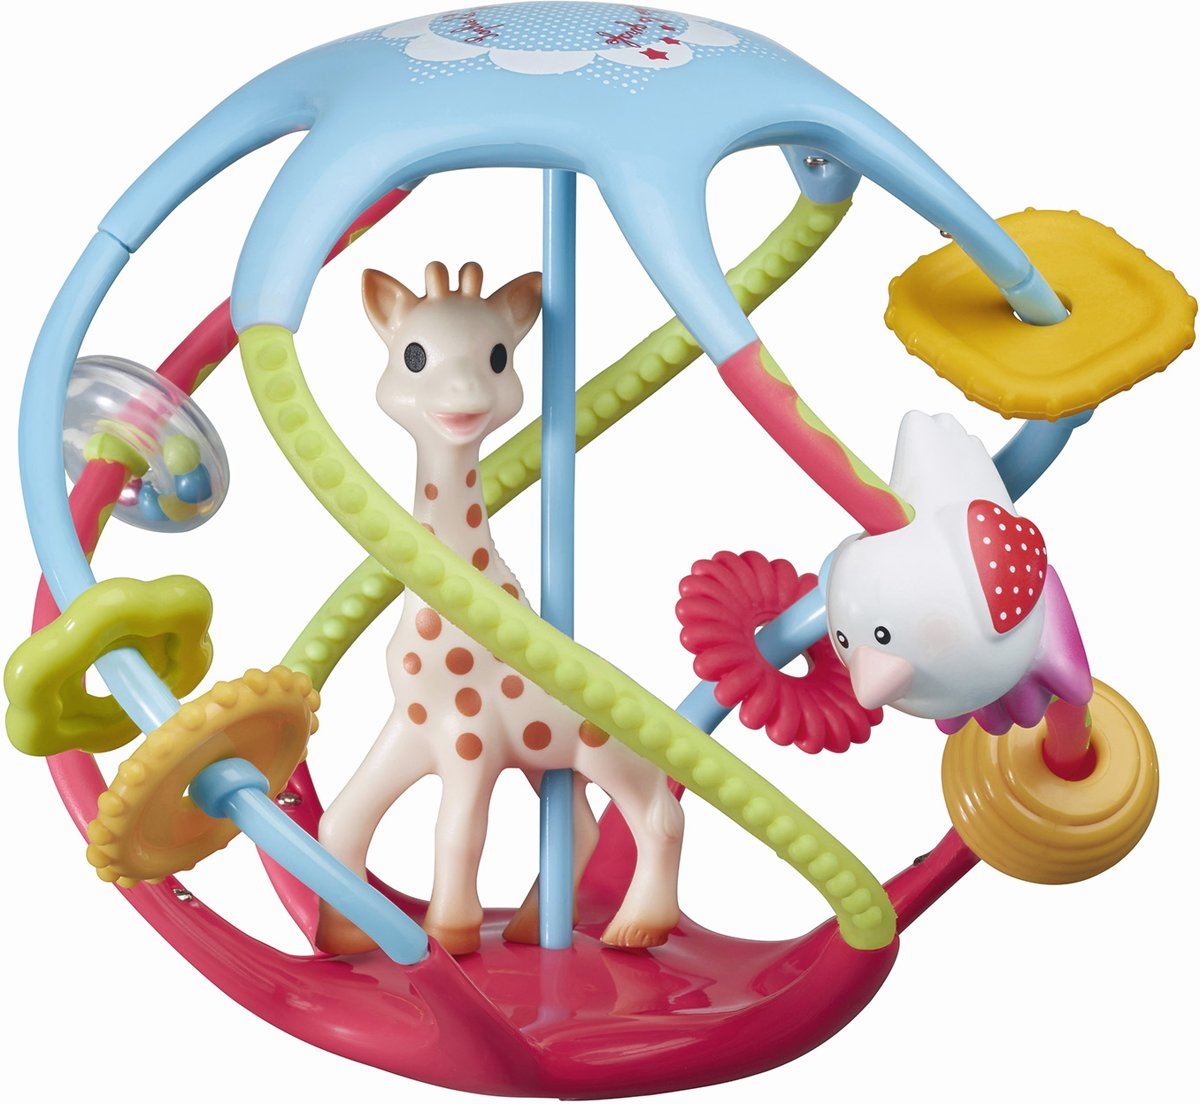 Sophie de Giraf Twistin ball